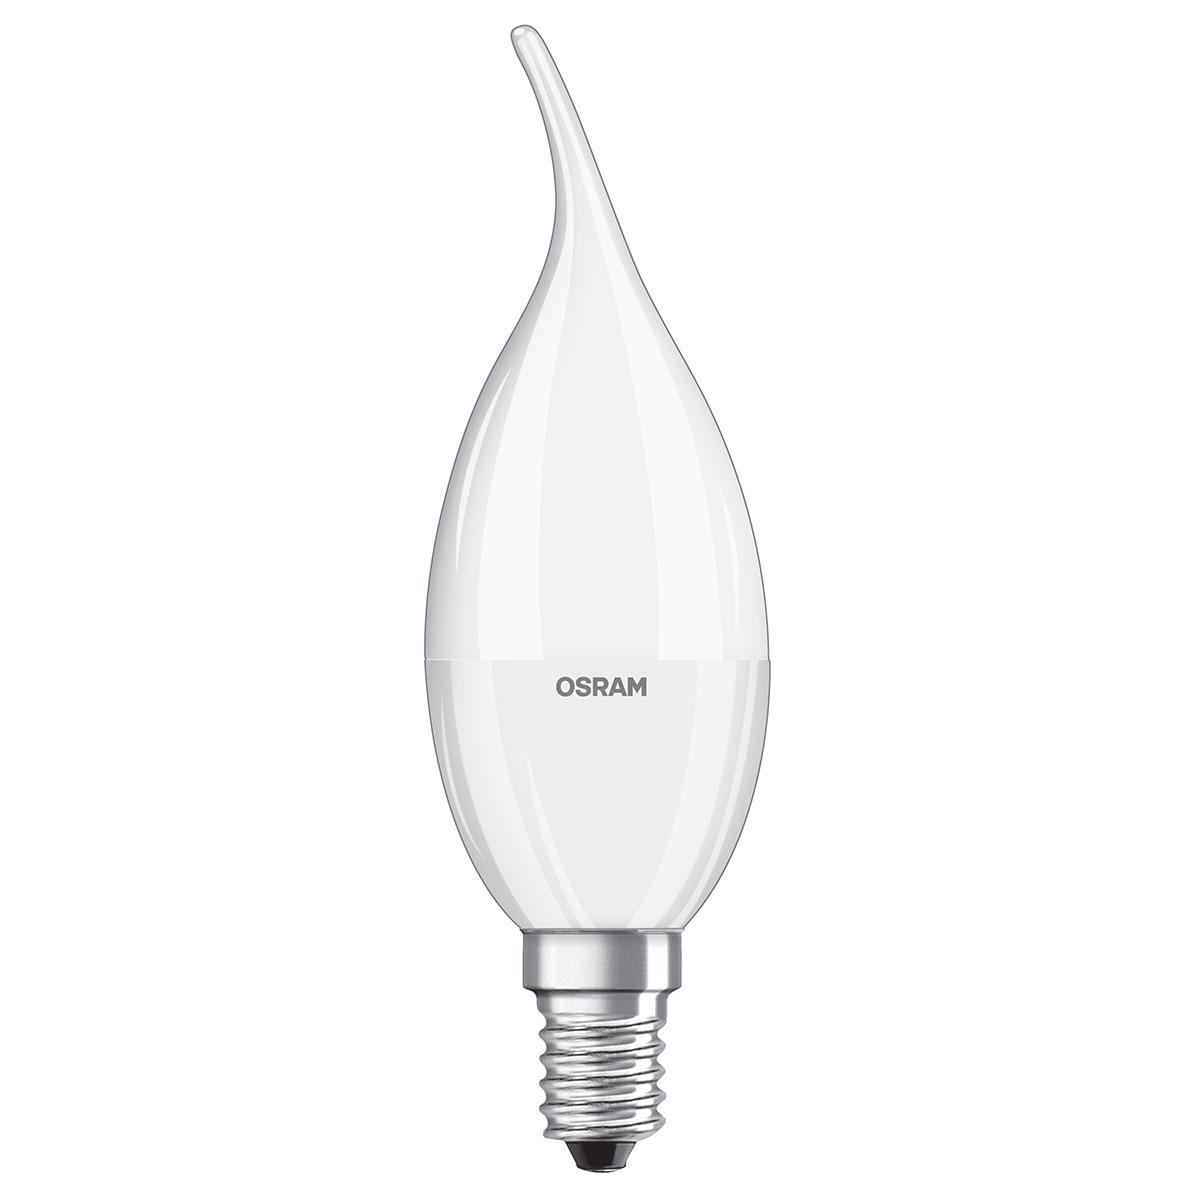 Osram Ampoule Led Retrofit Standard E27 4w 40w A: OSRAM Ampoule LED Superstar Classic Flamme E14 6.7W (40W